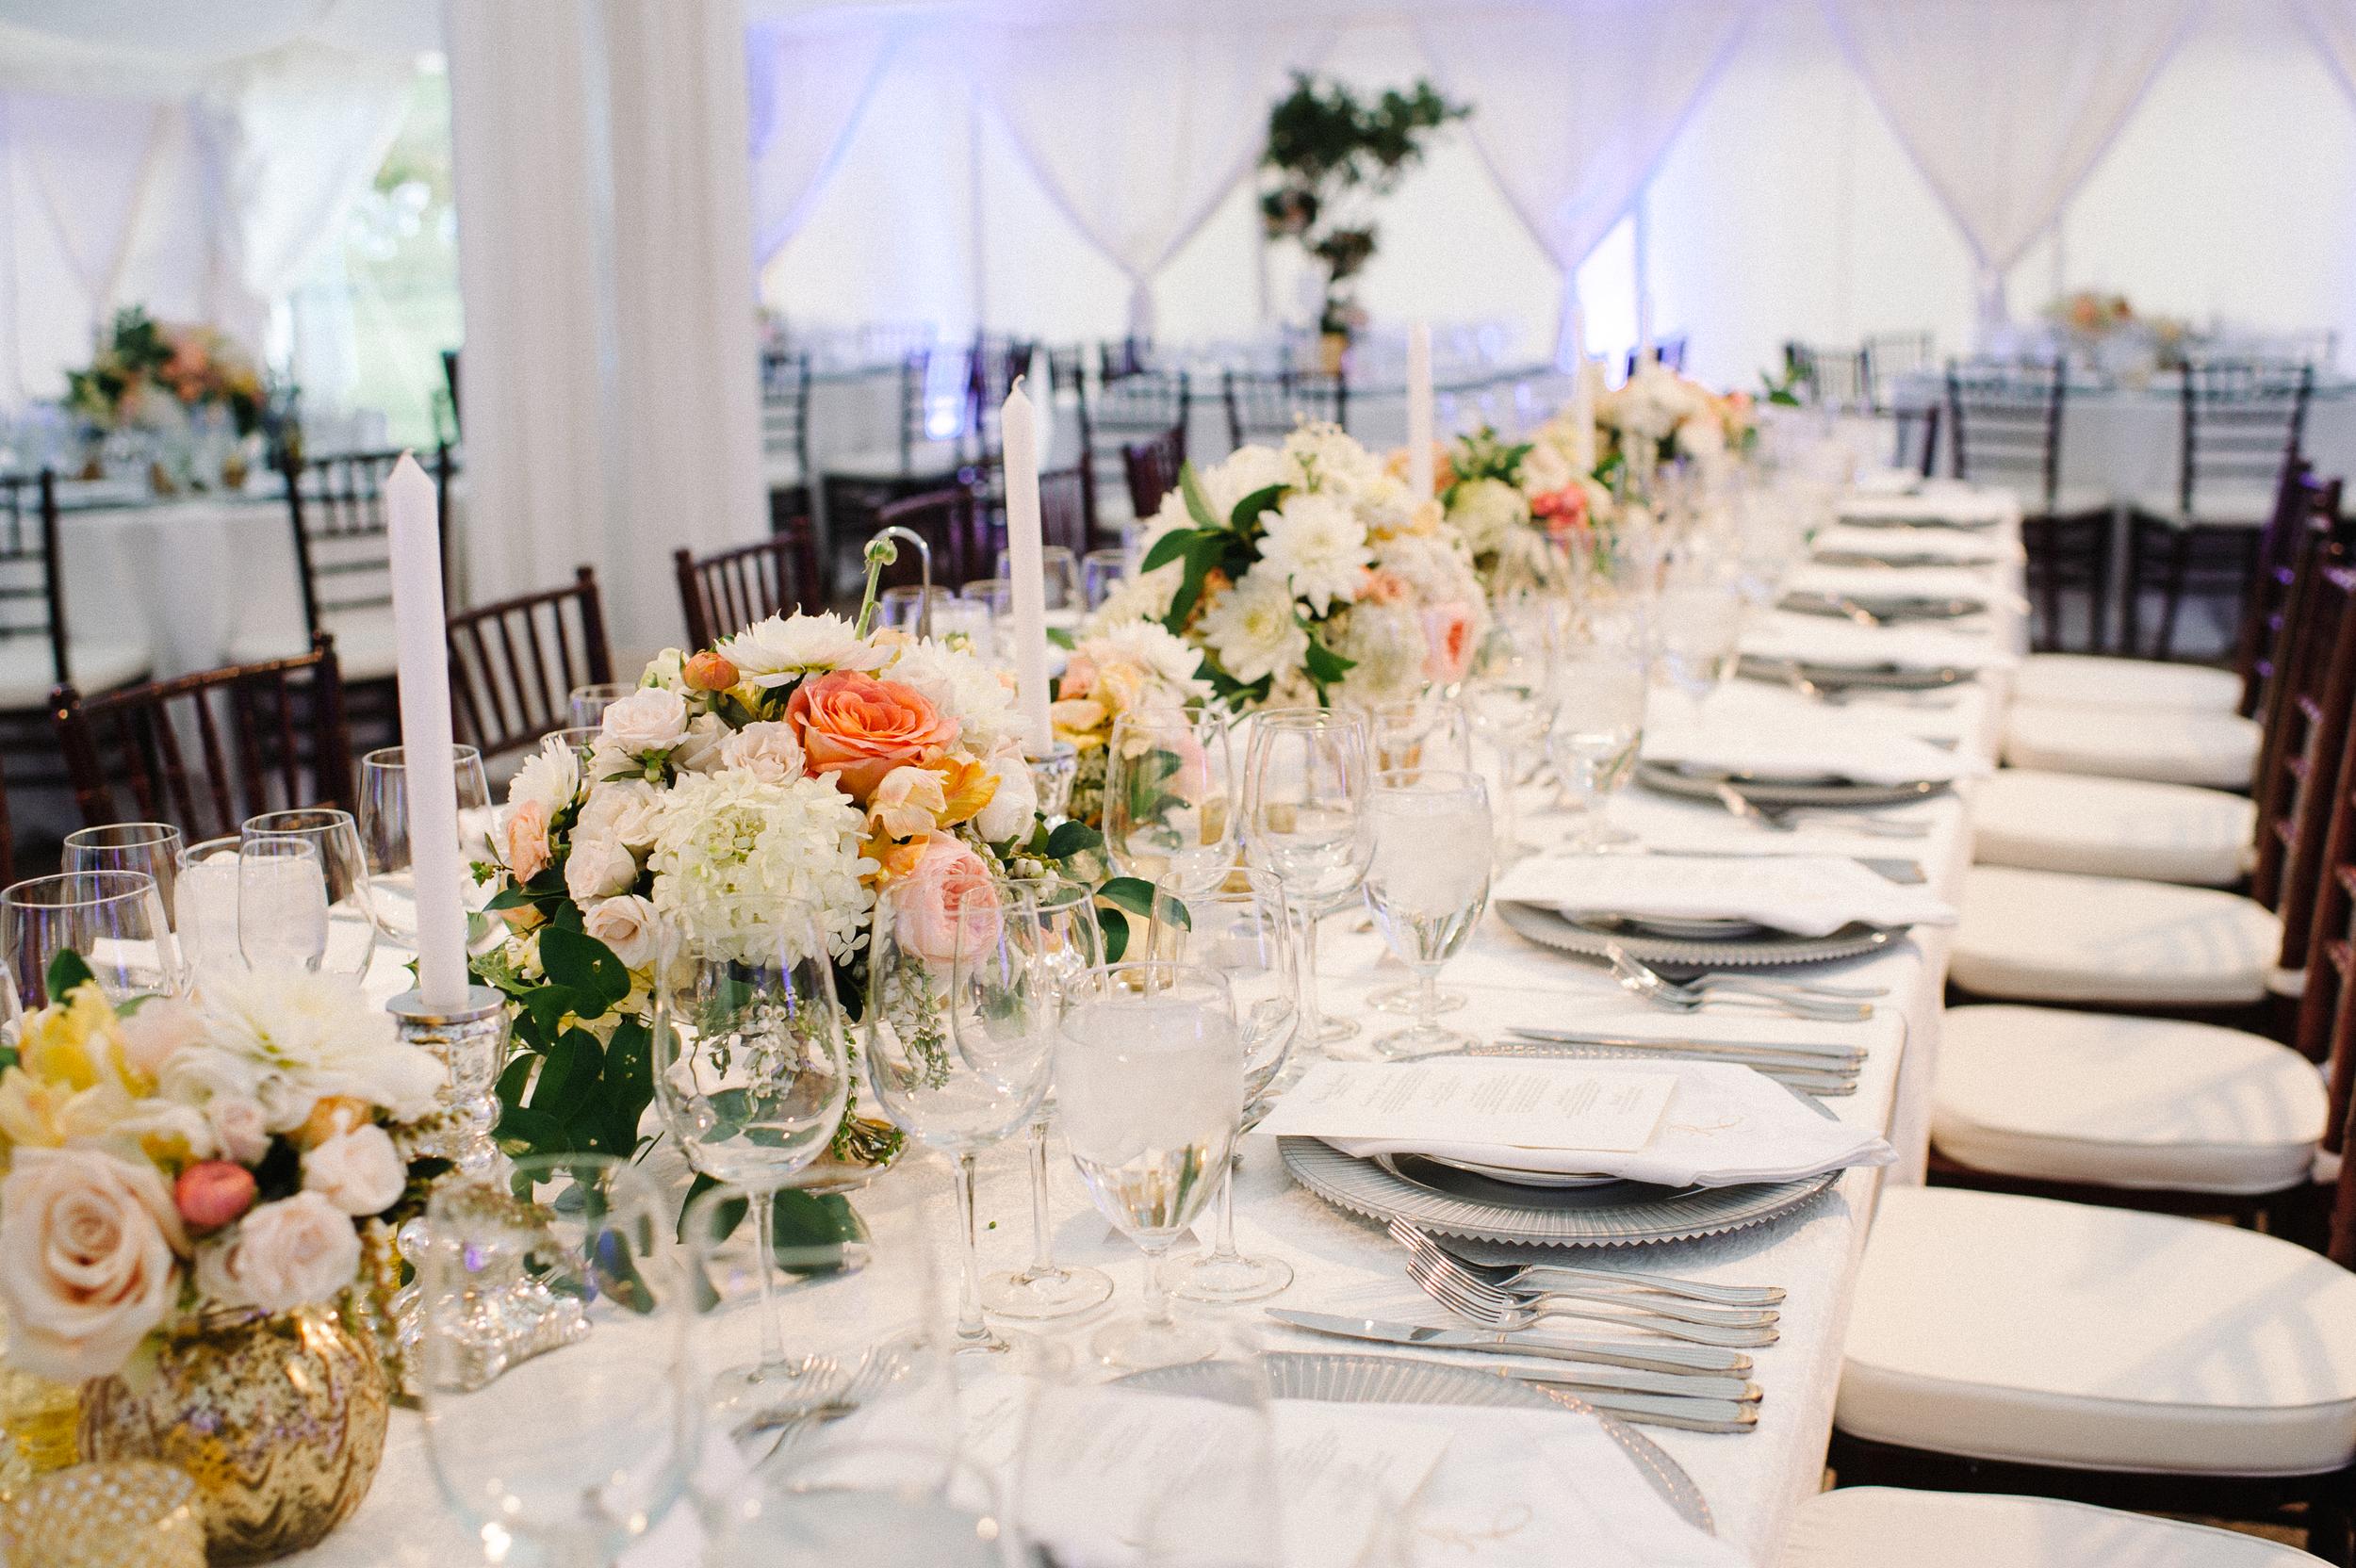 Vintage themed wedding reception